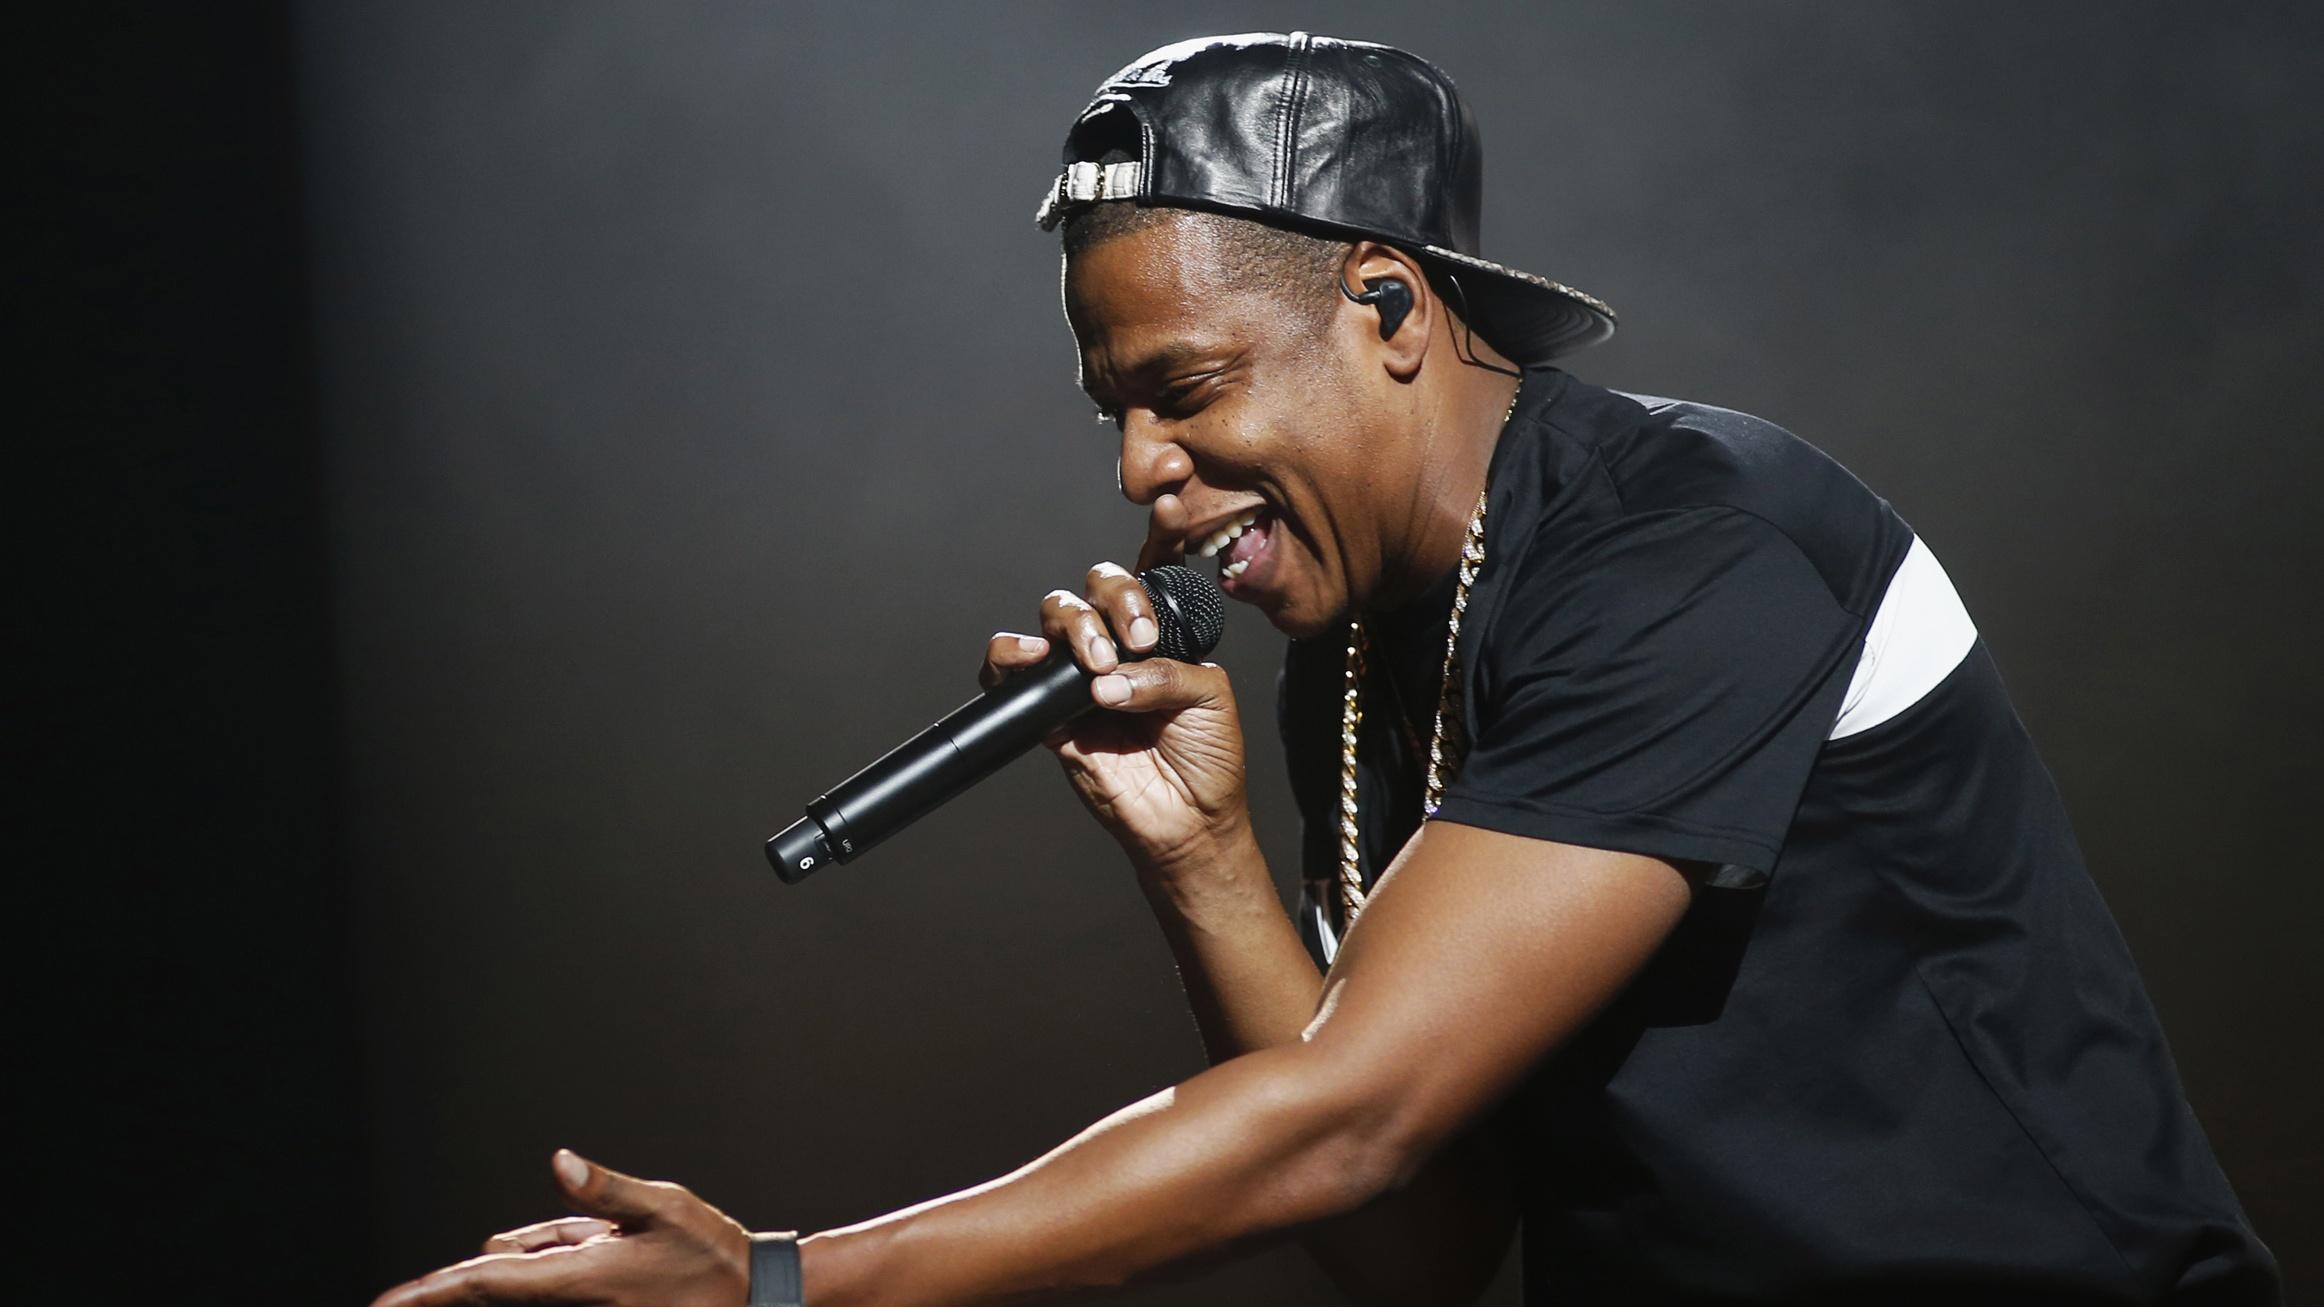 American rapper Jay-Z performs at Bercy stadium in Paris, October 17, 2013. REUTERS/Benoit Tessier/File Photo